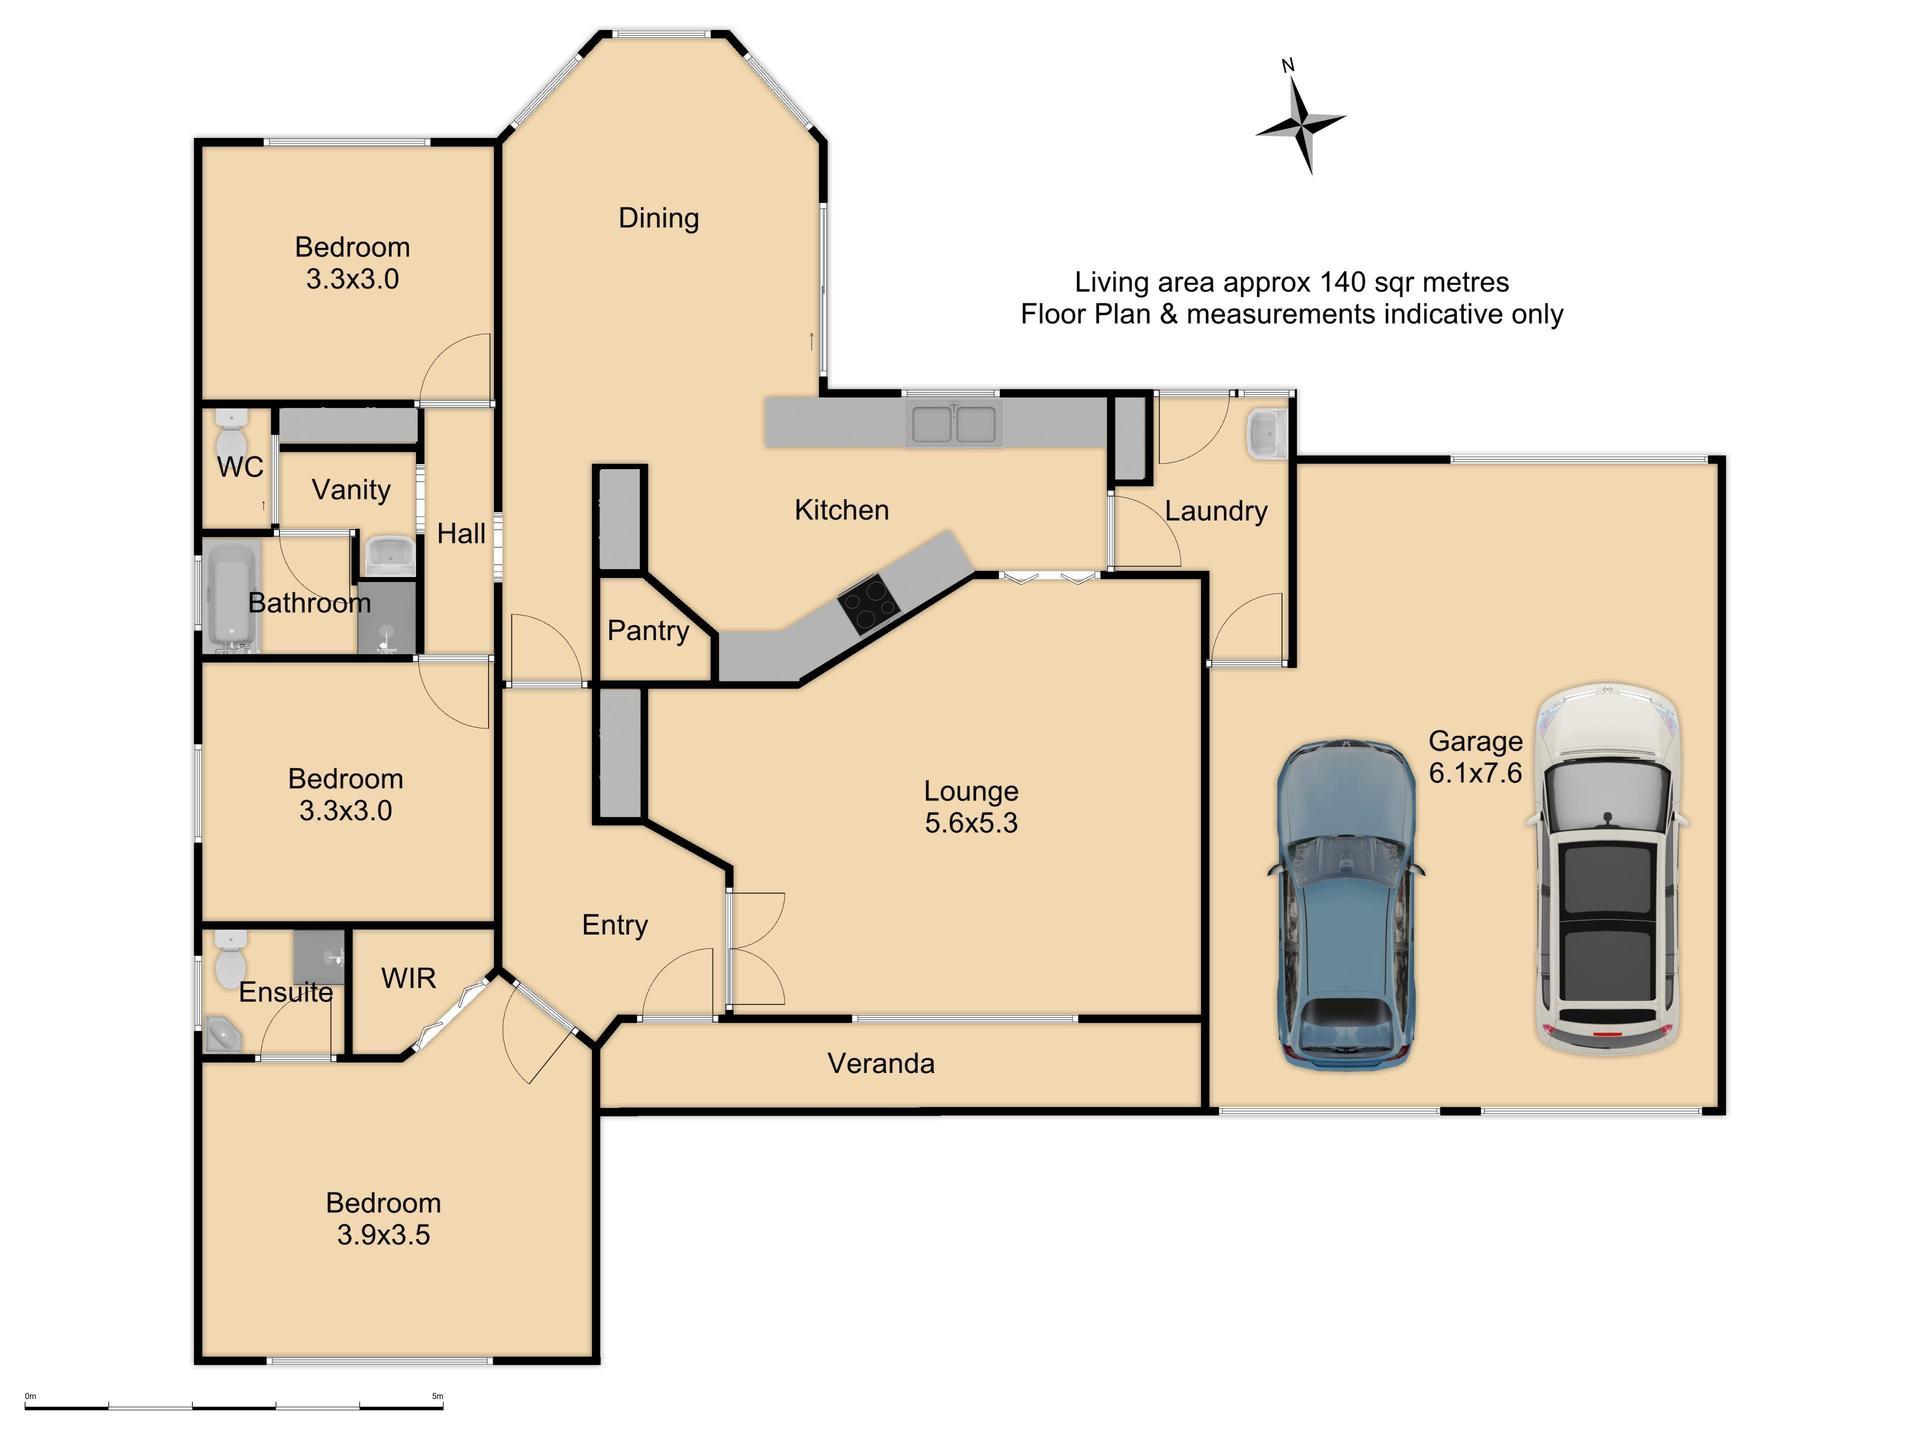 5 Gersbach Place - Floor Plan